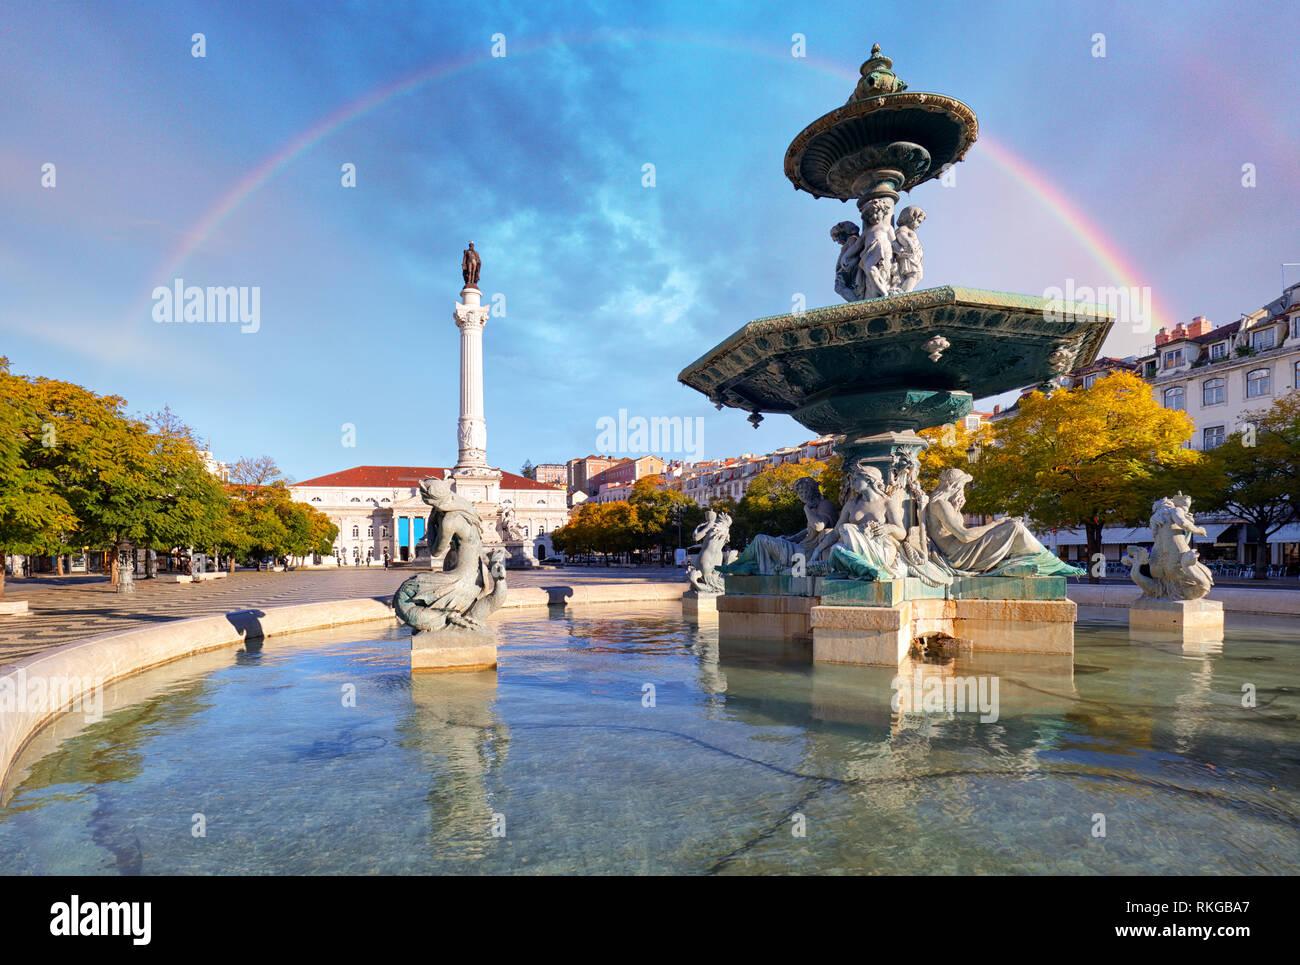 Rainbow over Rossio square in Lisbon Portugal Stock Photo